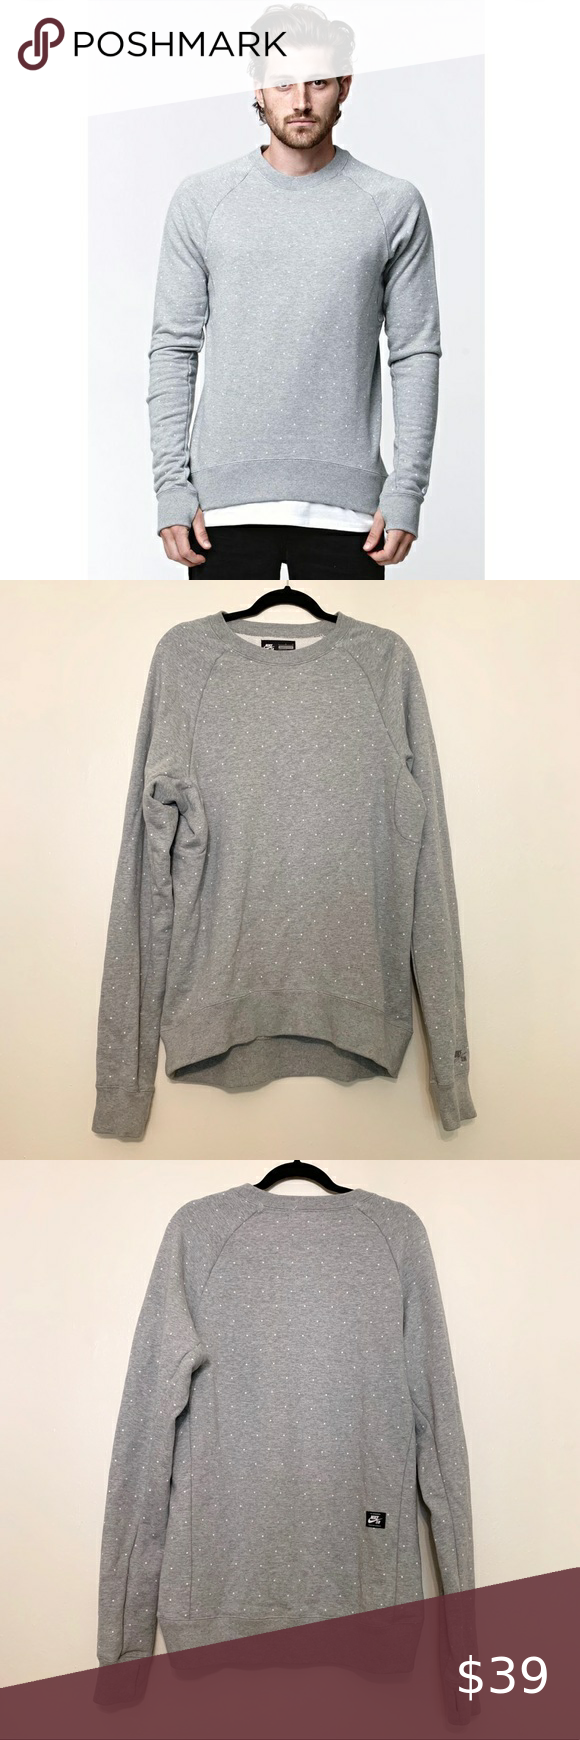 Nike Sb Everett Polka Dot Crewneck Sweatshirt In 2021 Clothes Design Crew Neck Sweatshirt Fashion [ 1740 x 580 Pixel ]